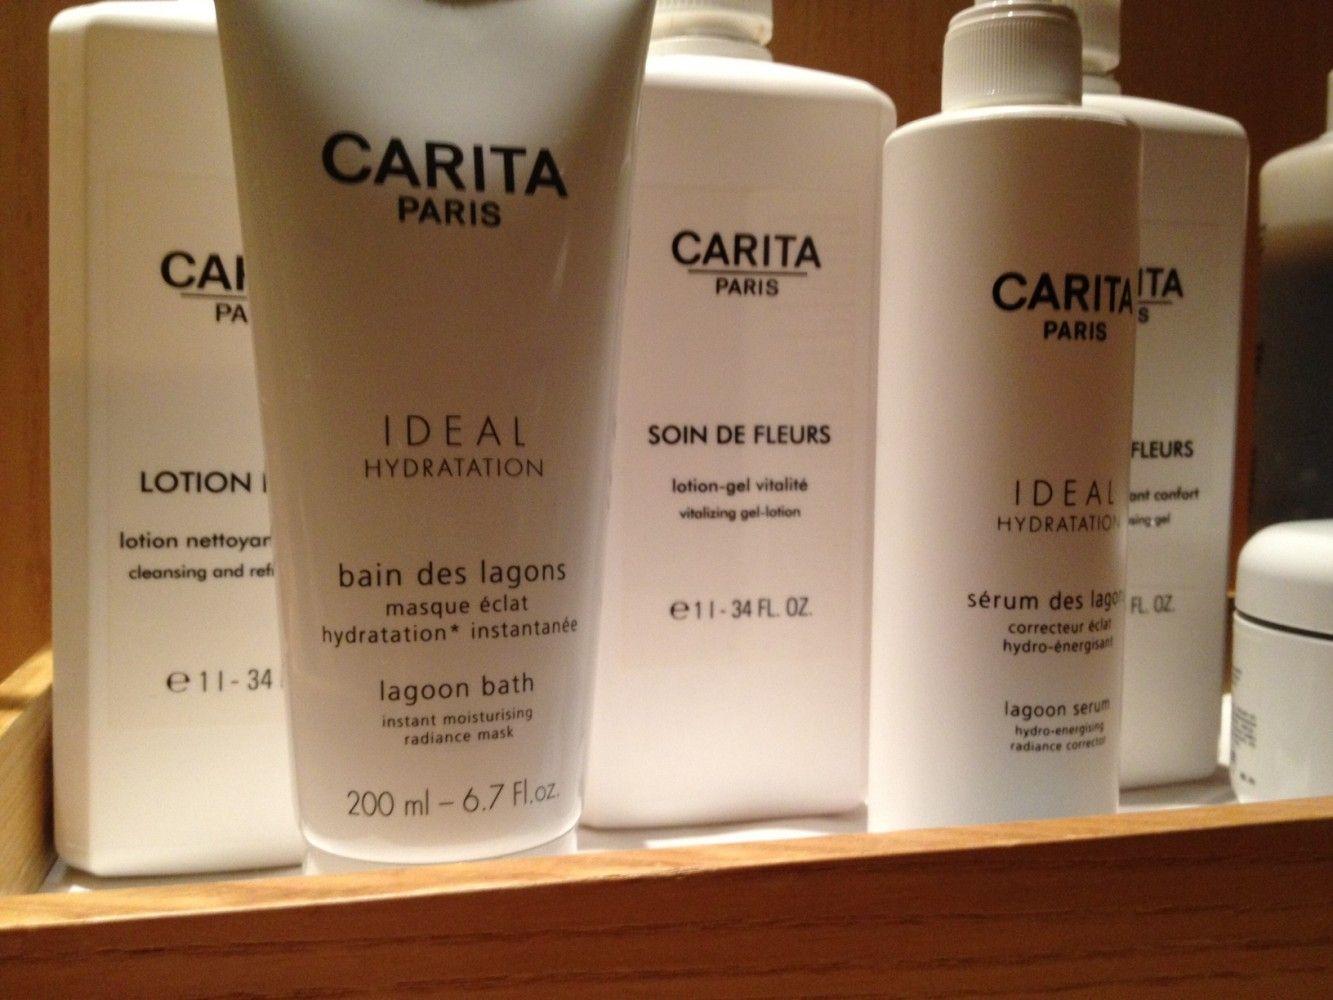 Review: Carita Renovateur Hydration Intense Facial at the